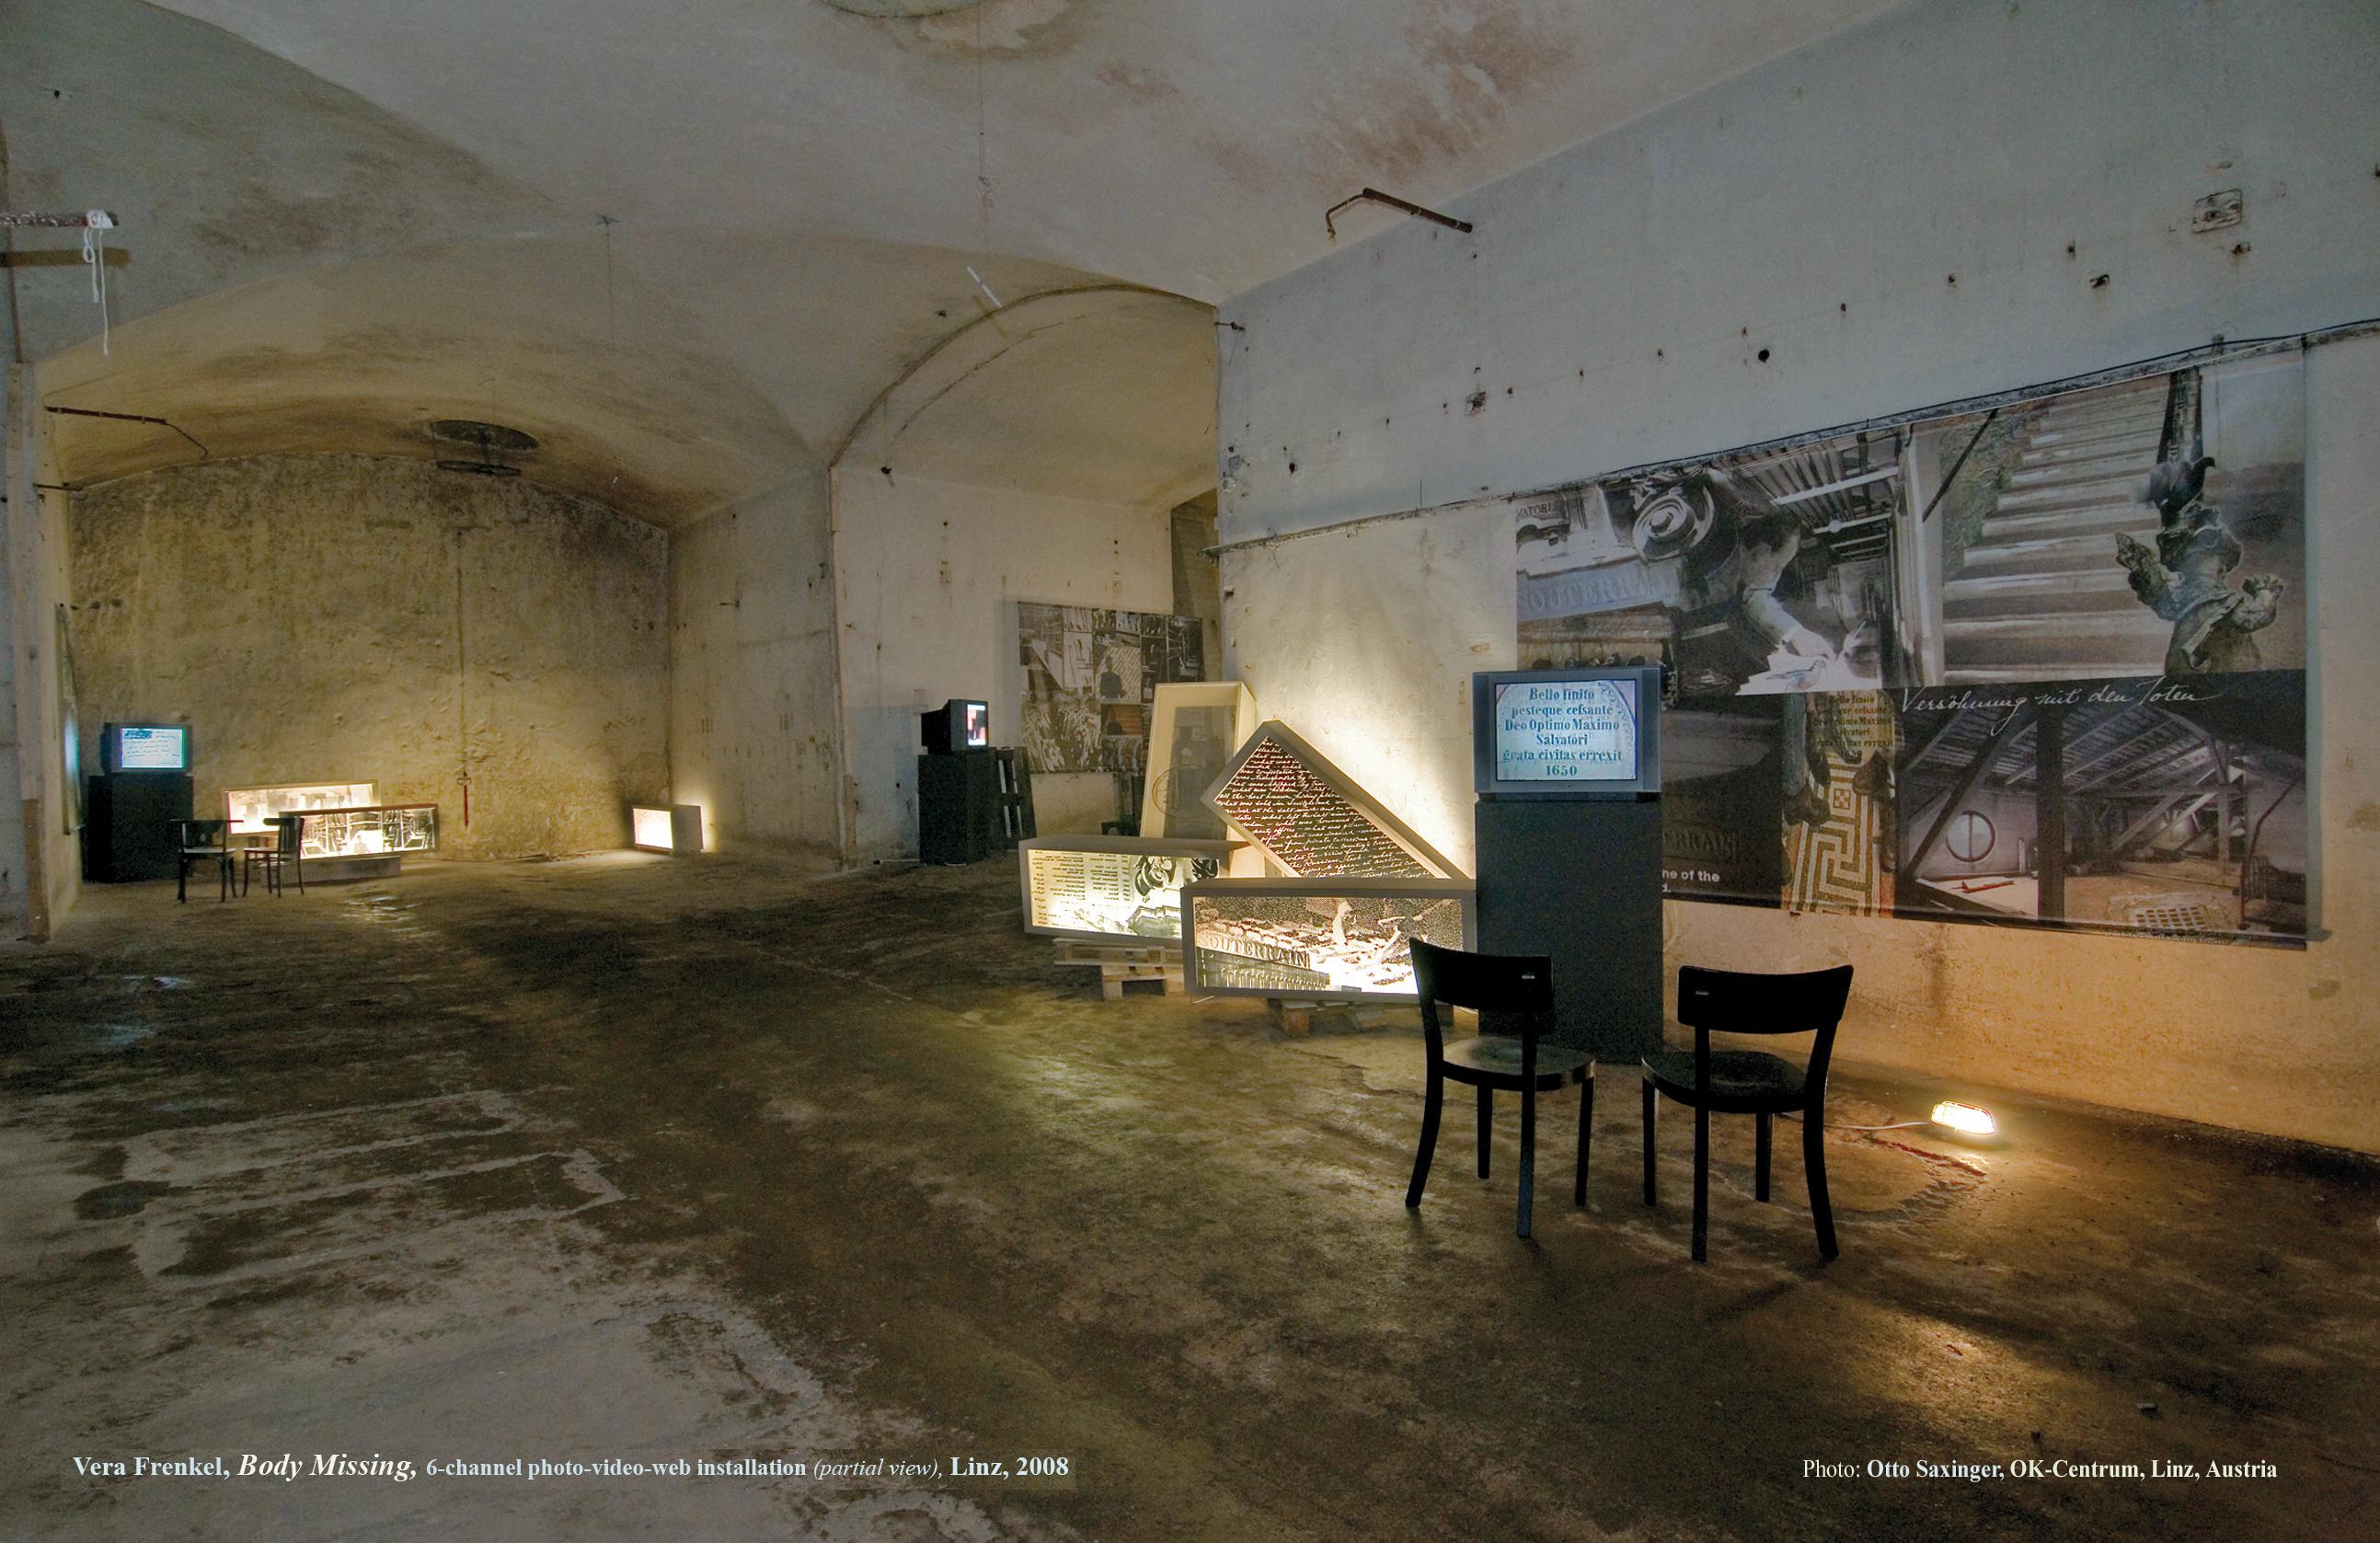 Vera Frenkel's Body Missing installation